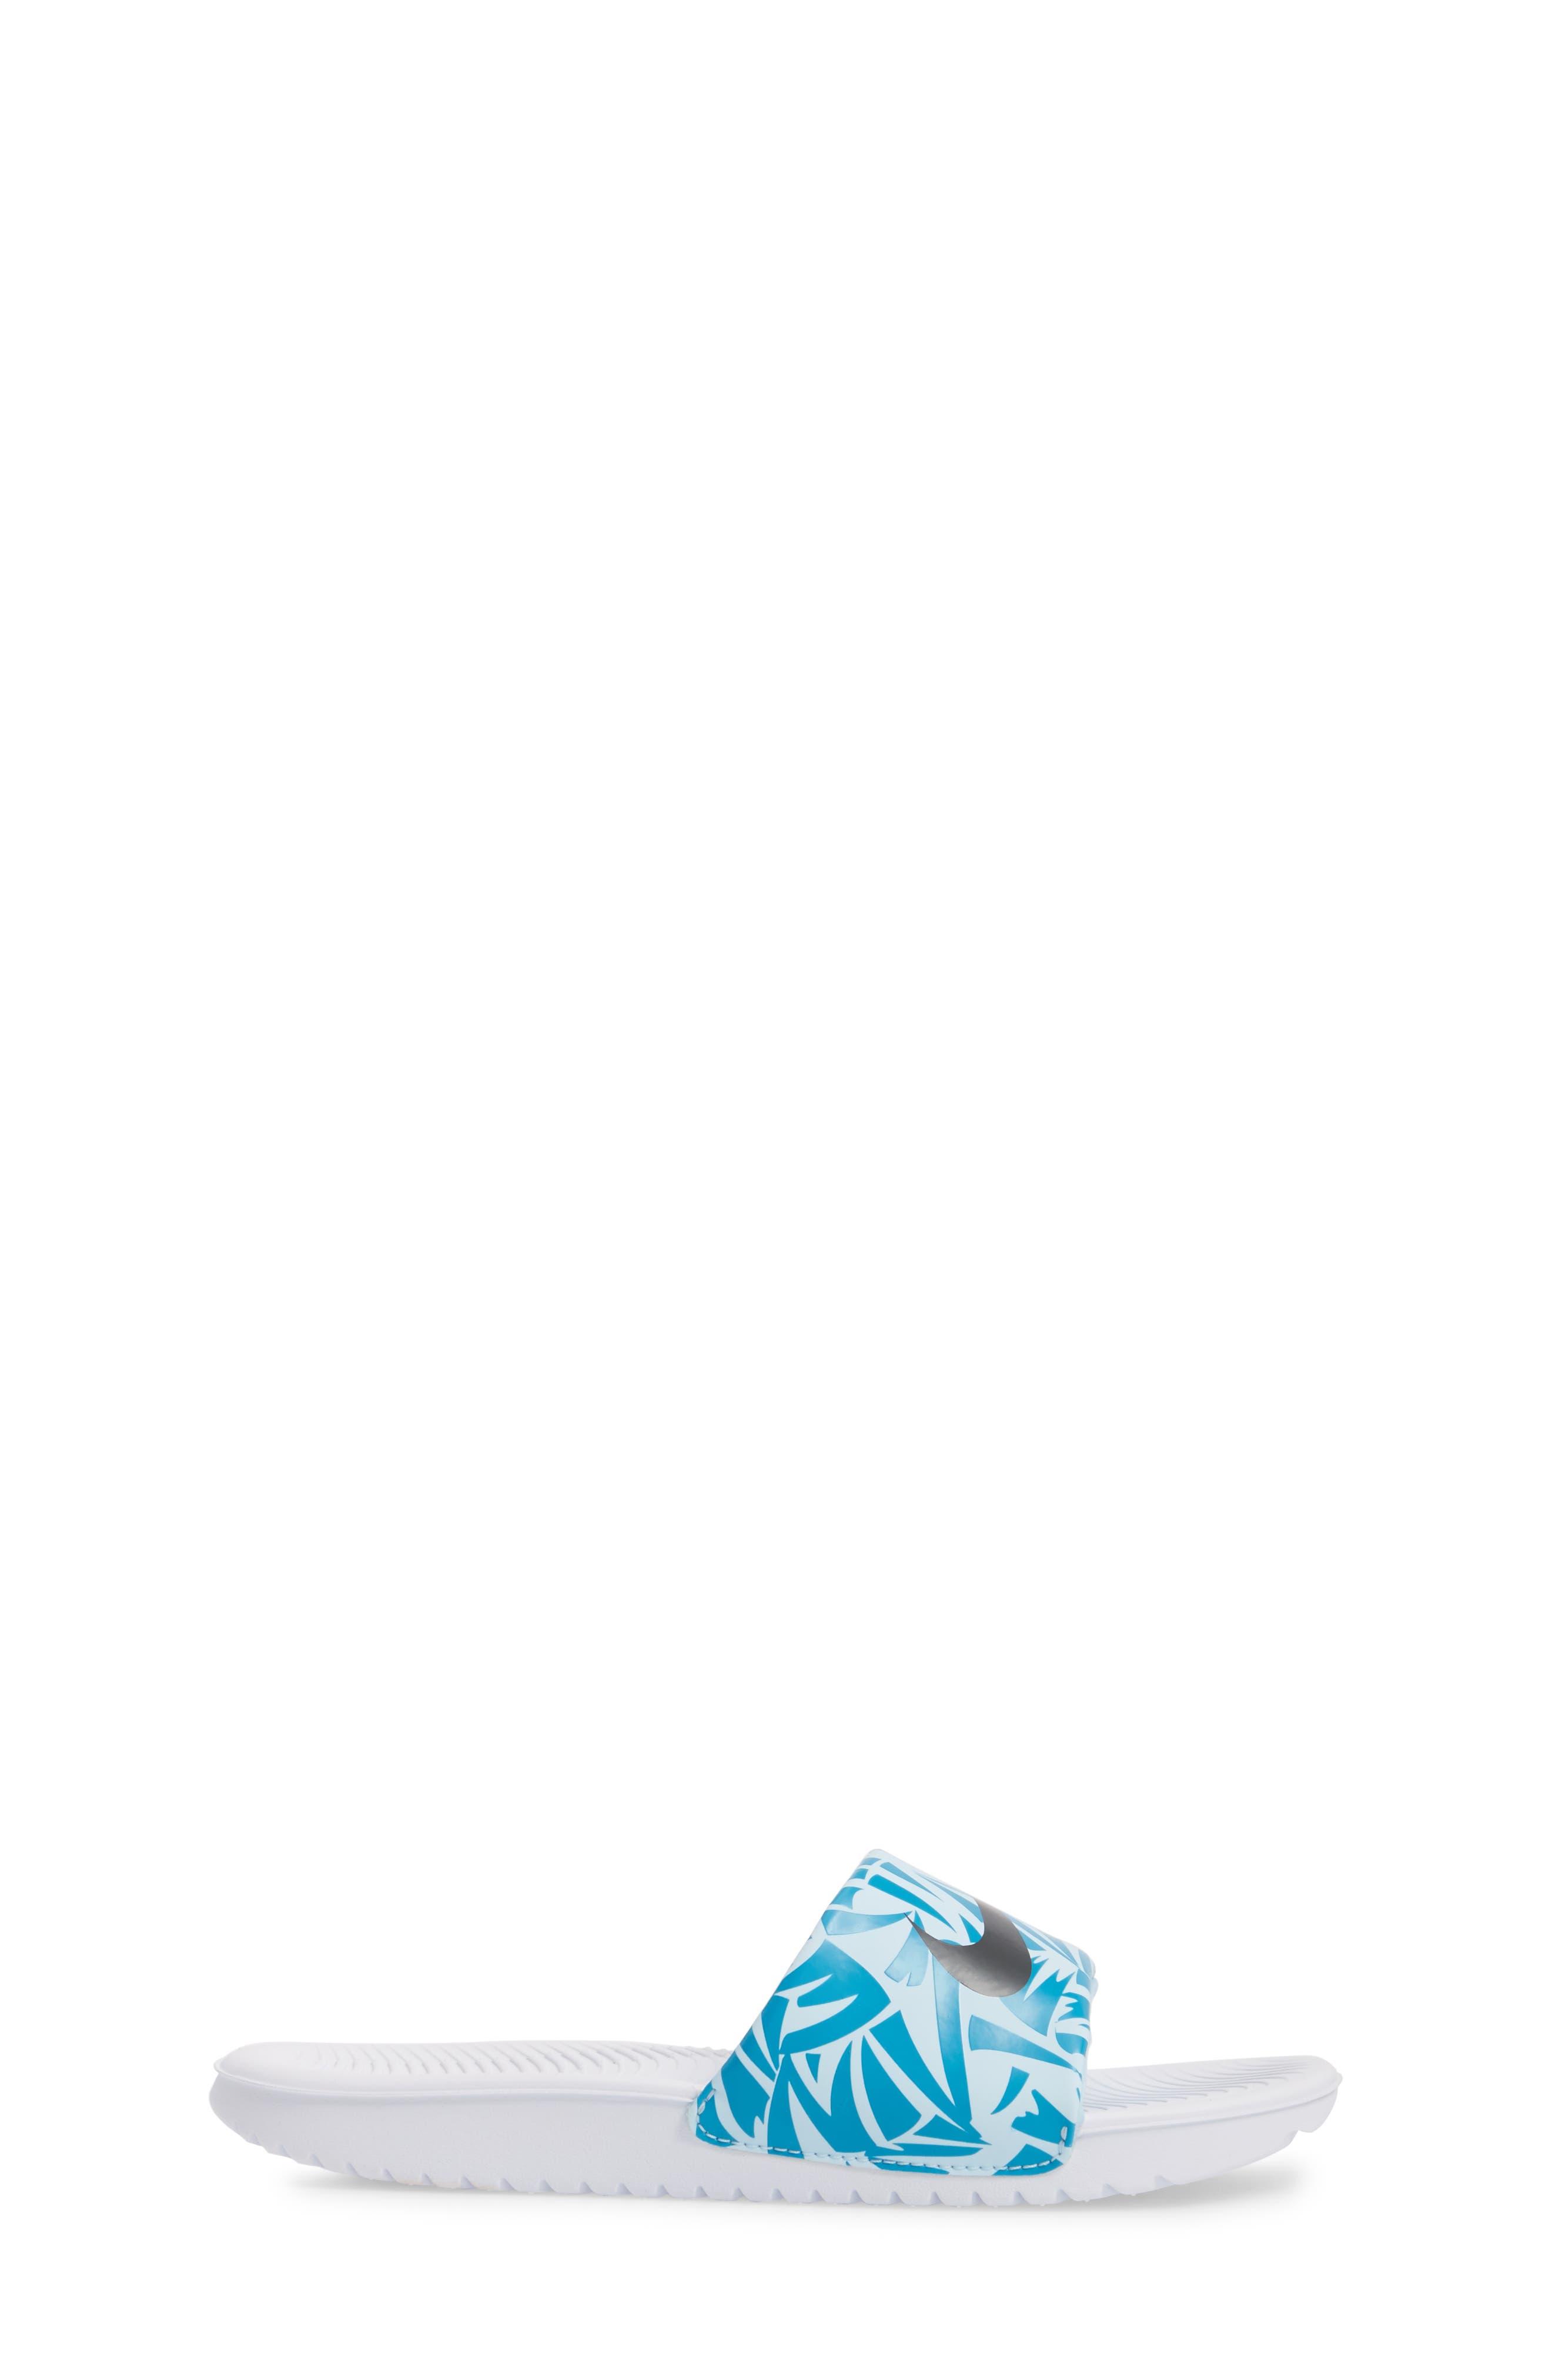 'Kawa' Print Slide Sandal,                             Alternate thumbnail 3, color,                             White/ Anthracite/ Turquoise